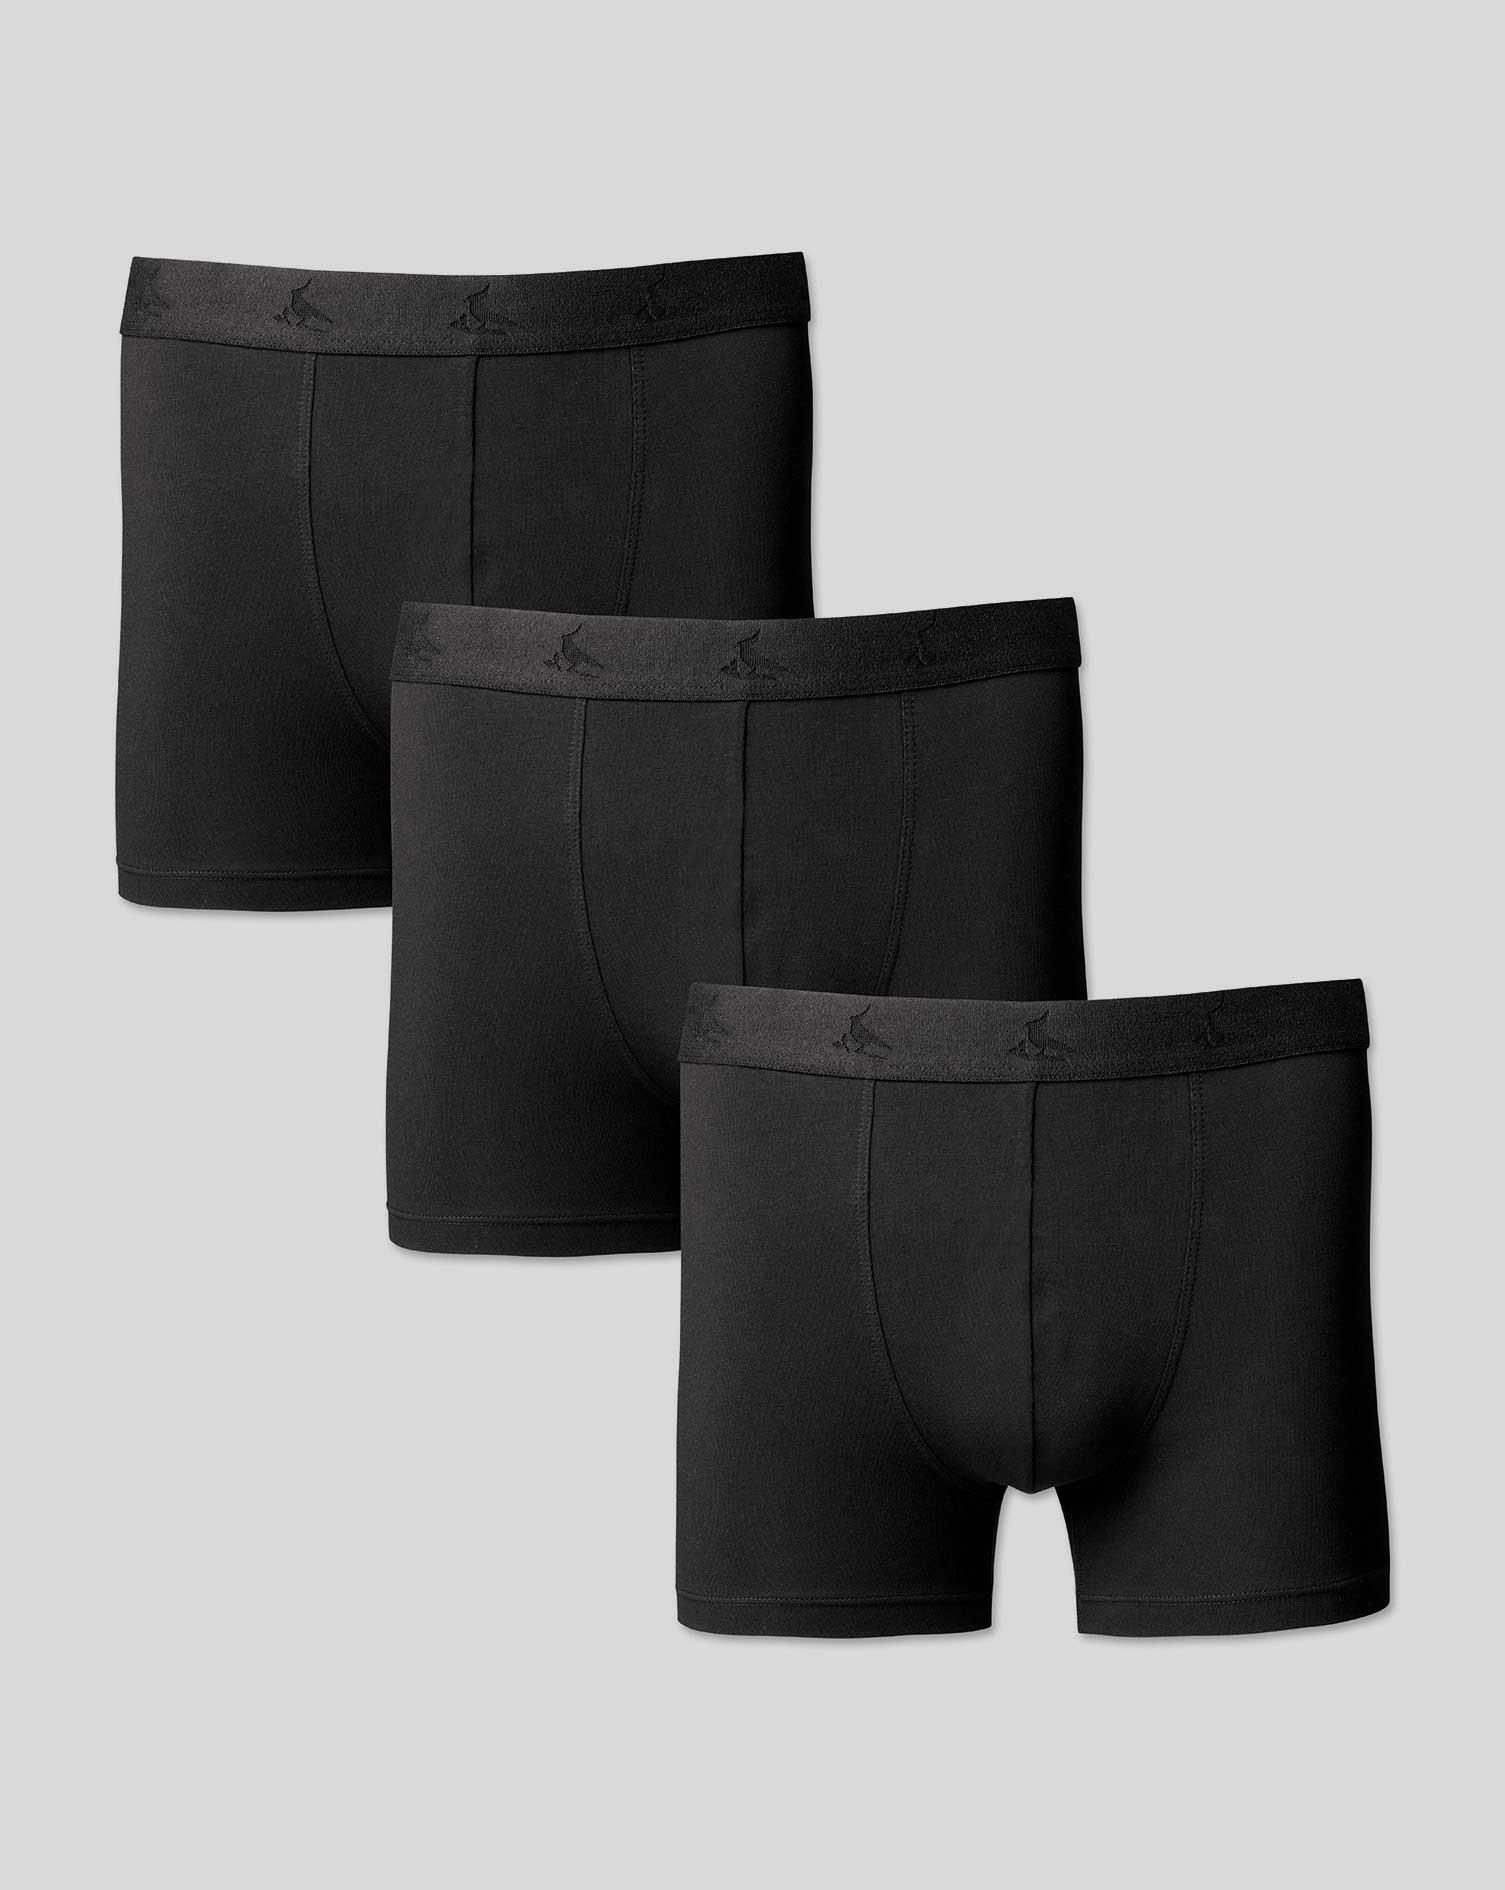 Image of Charles Tyrwhitt 3 Pack Cotton Stretch Jersey Trunks - Black Size Medium by Charles Tyrwhitt